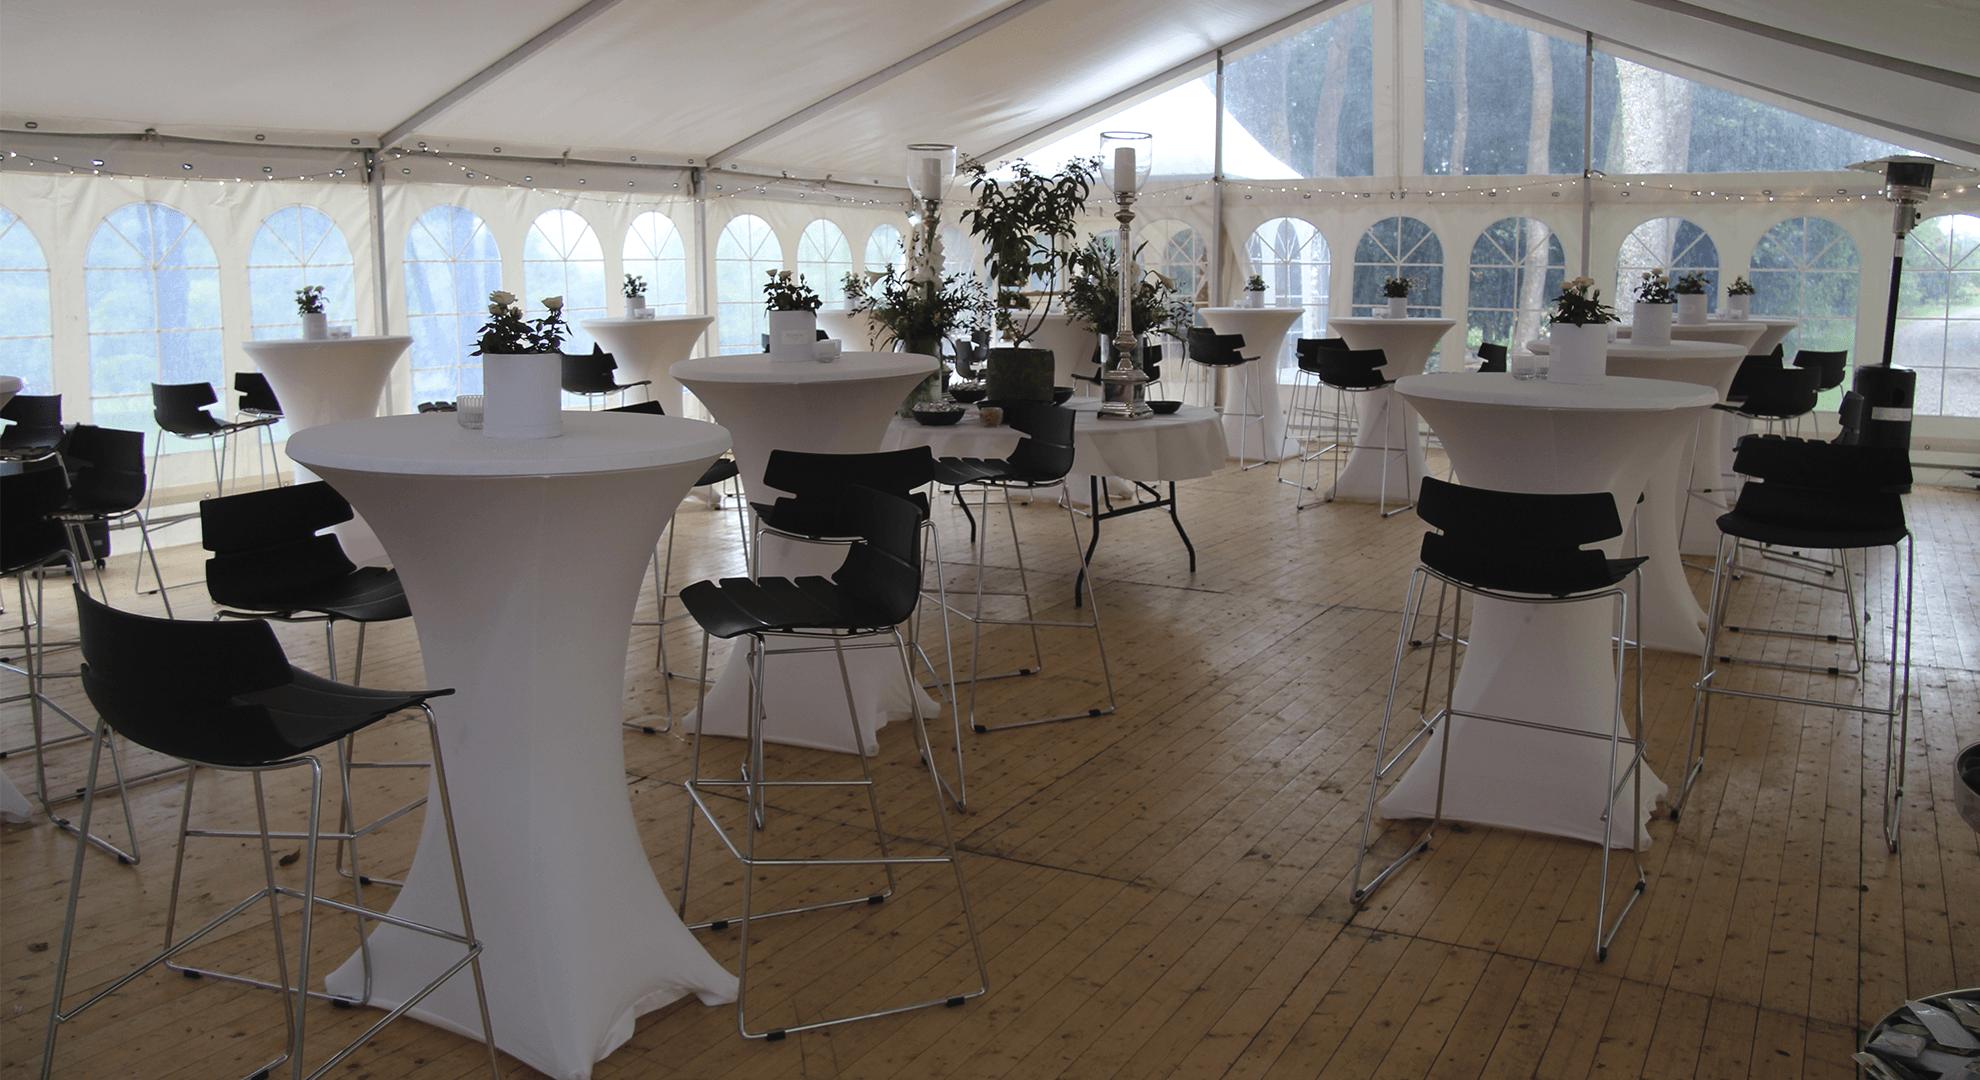 lpungemøbler reception i telt galleri